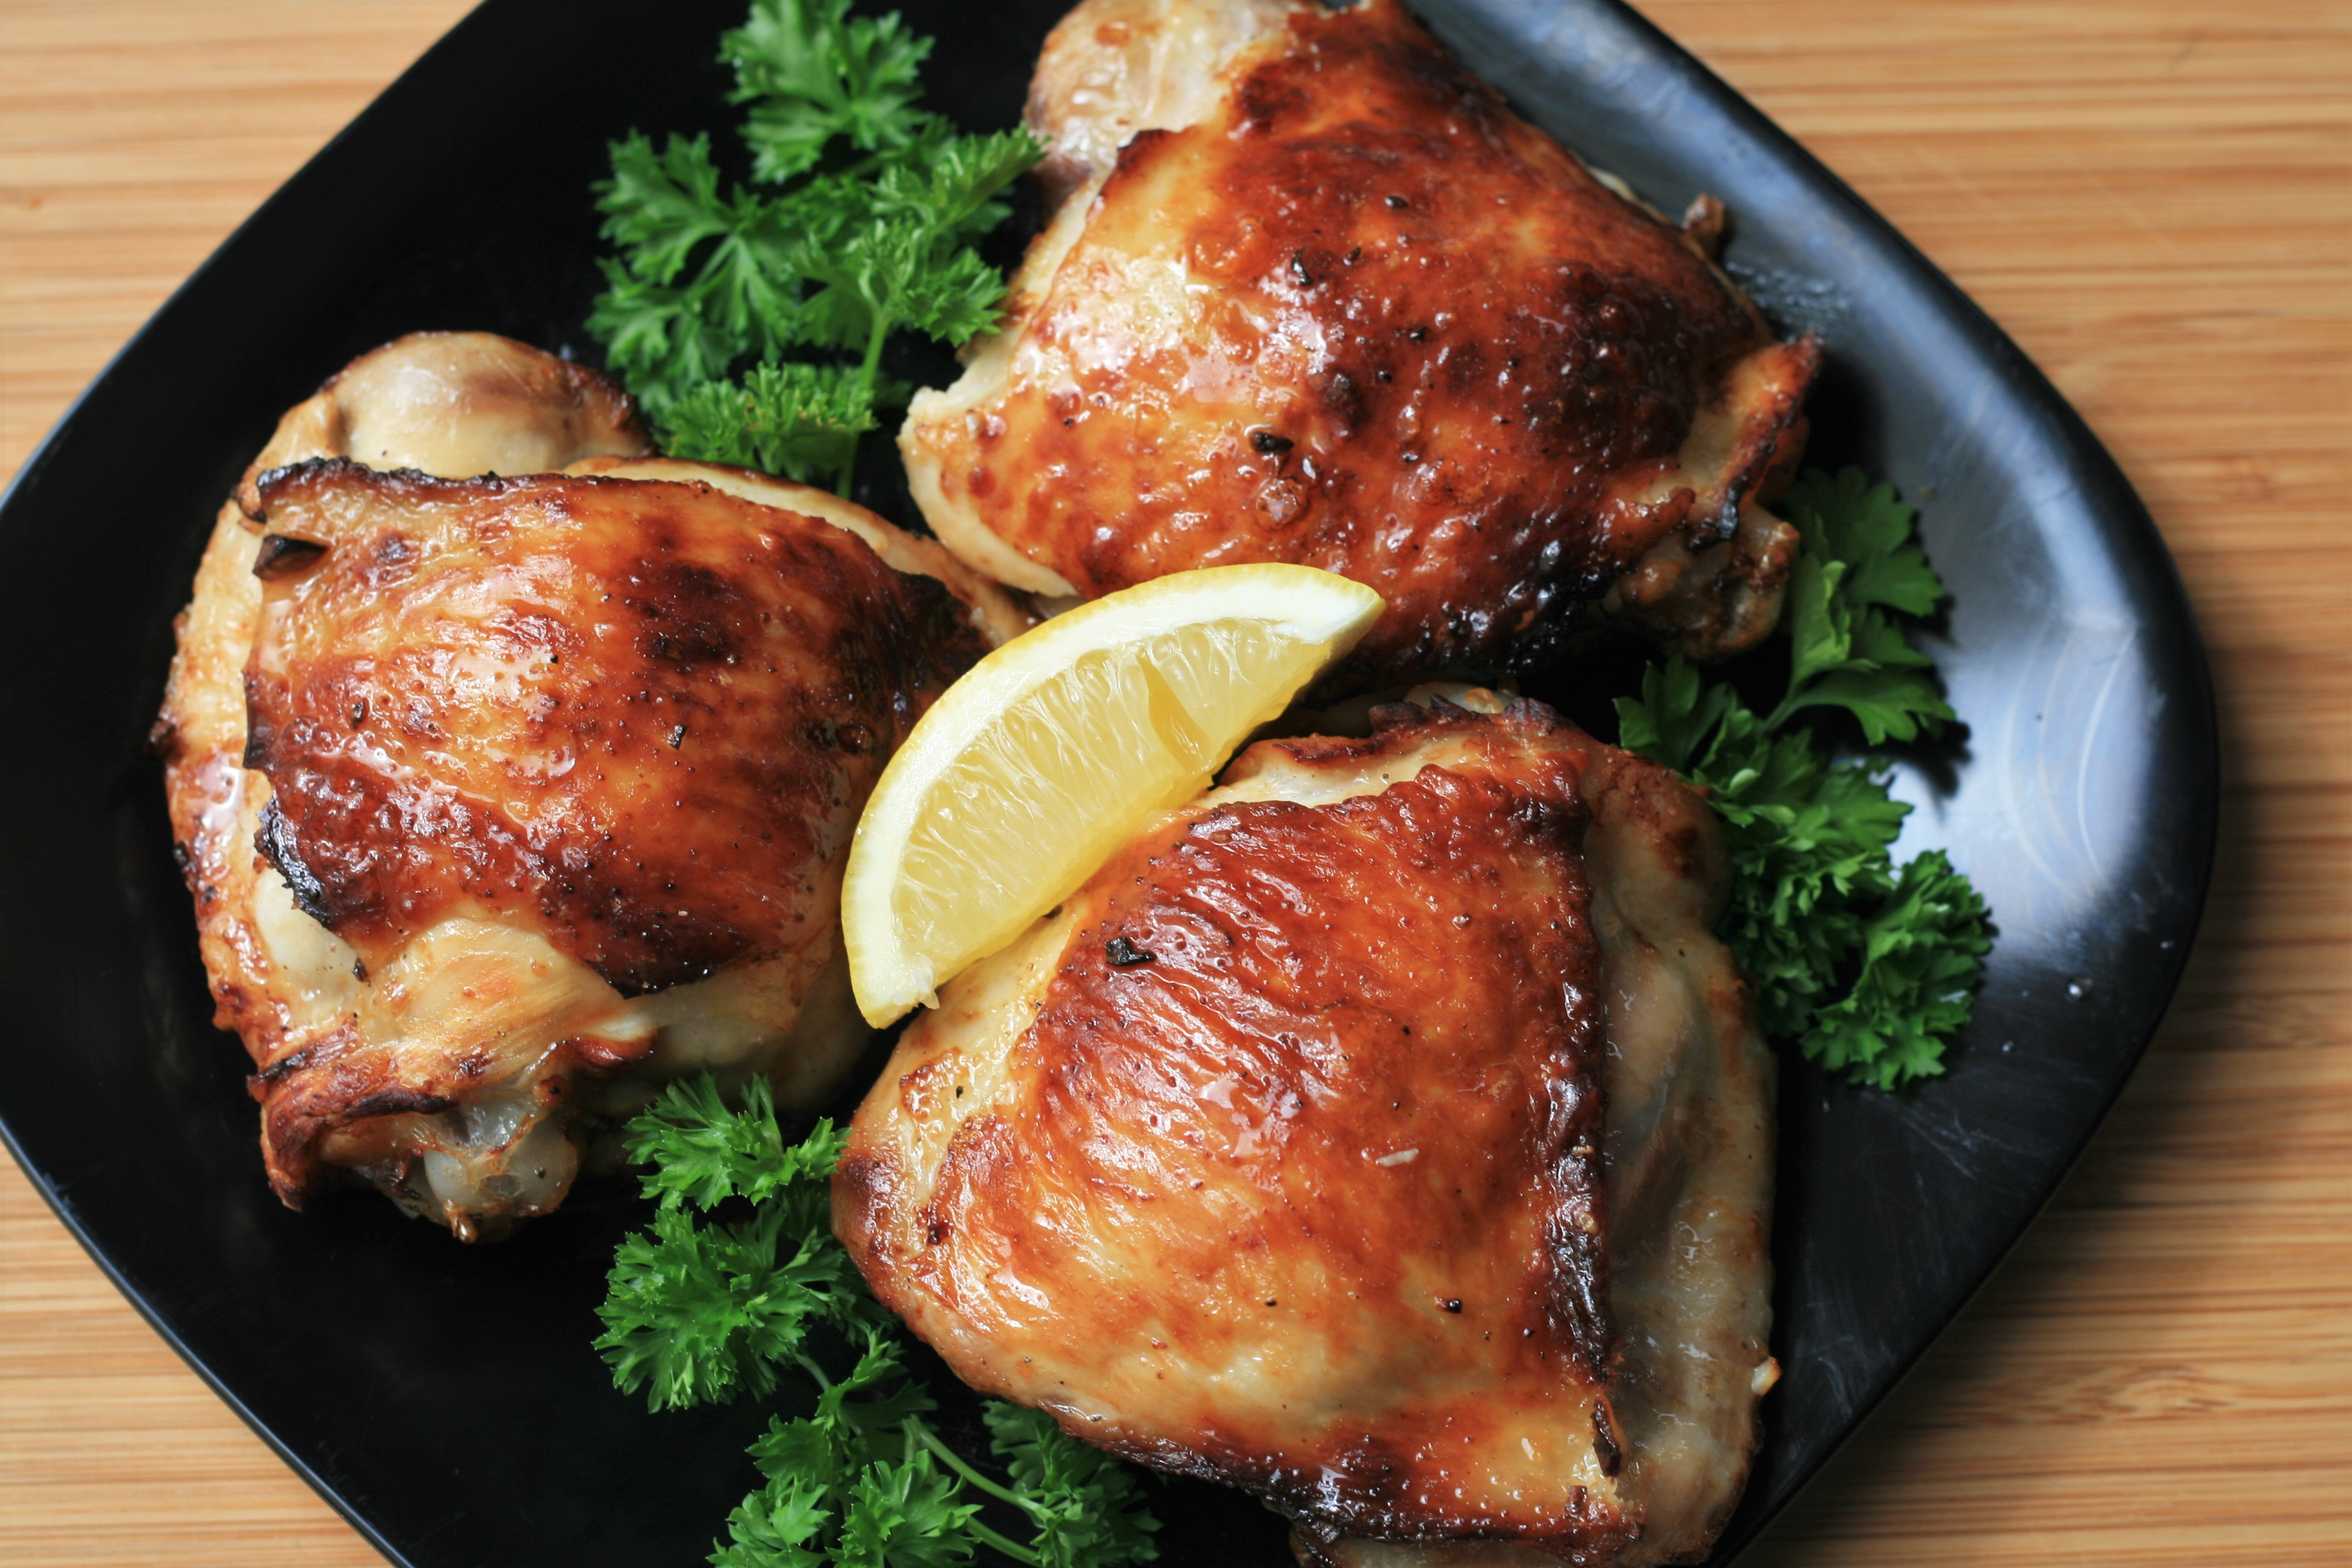 Keto Lemon-Garlic Chicken Thighs in the Air Fryer France C